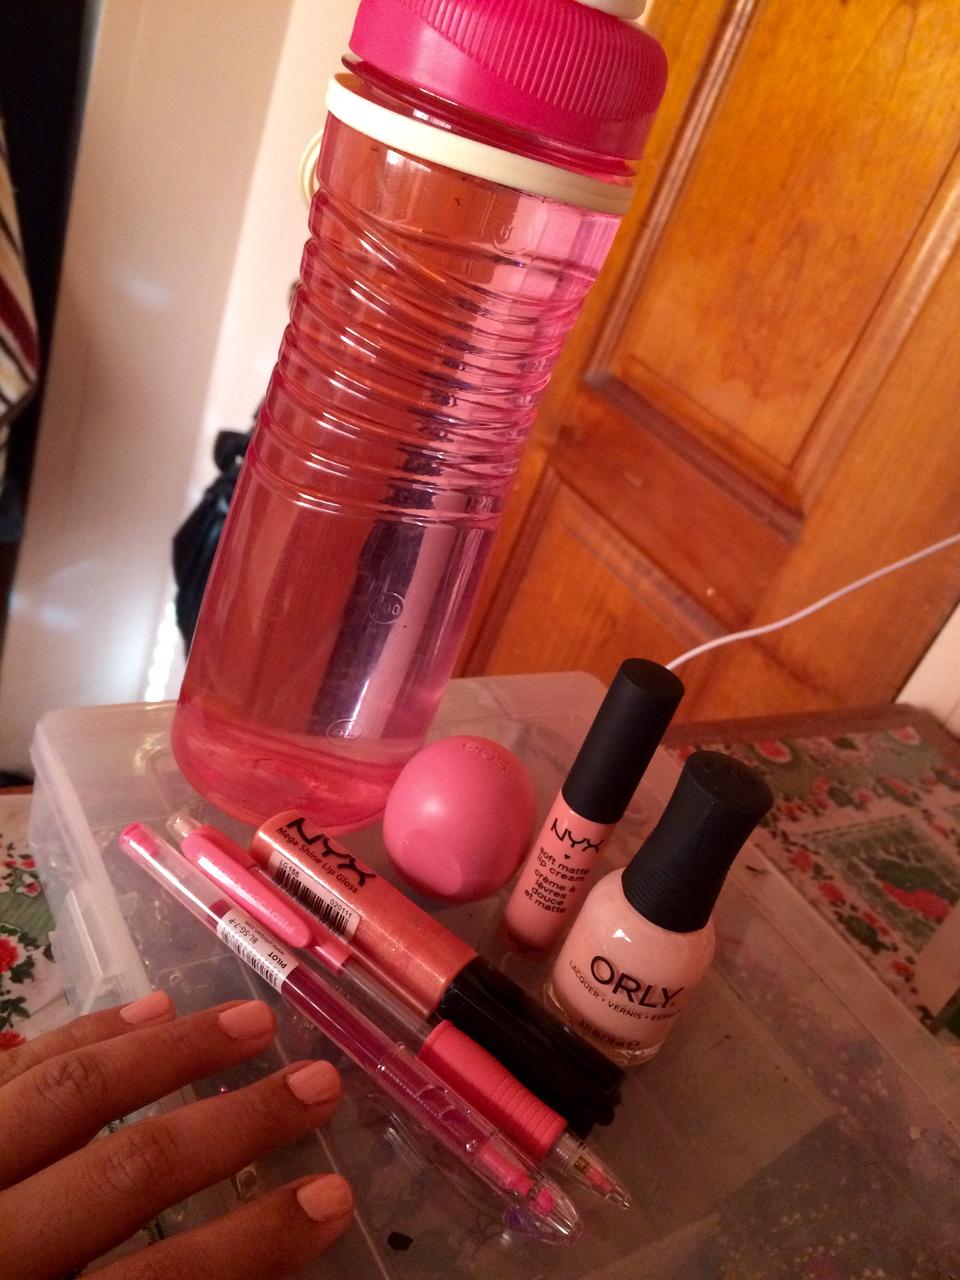 cosmetics, eos, and lip balm image